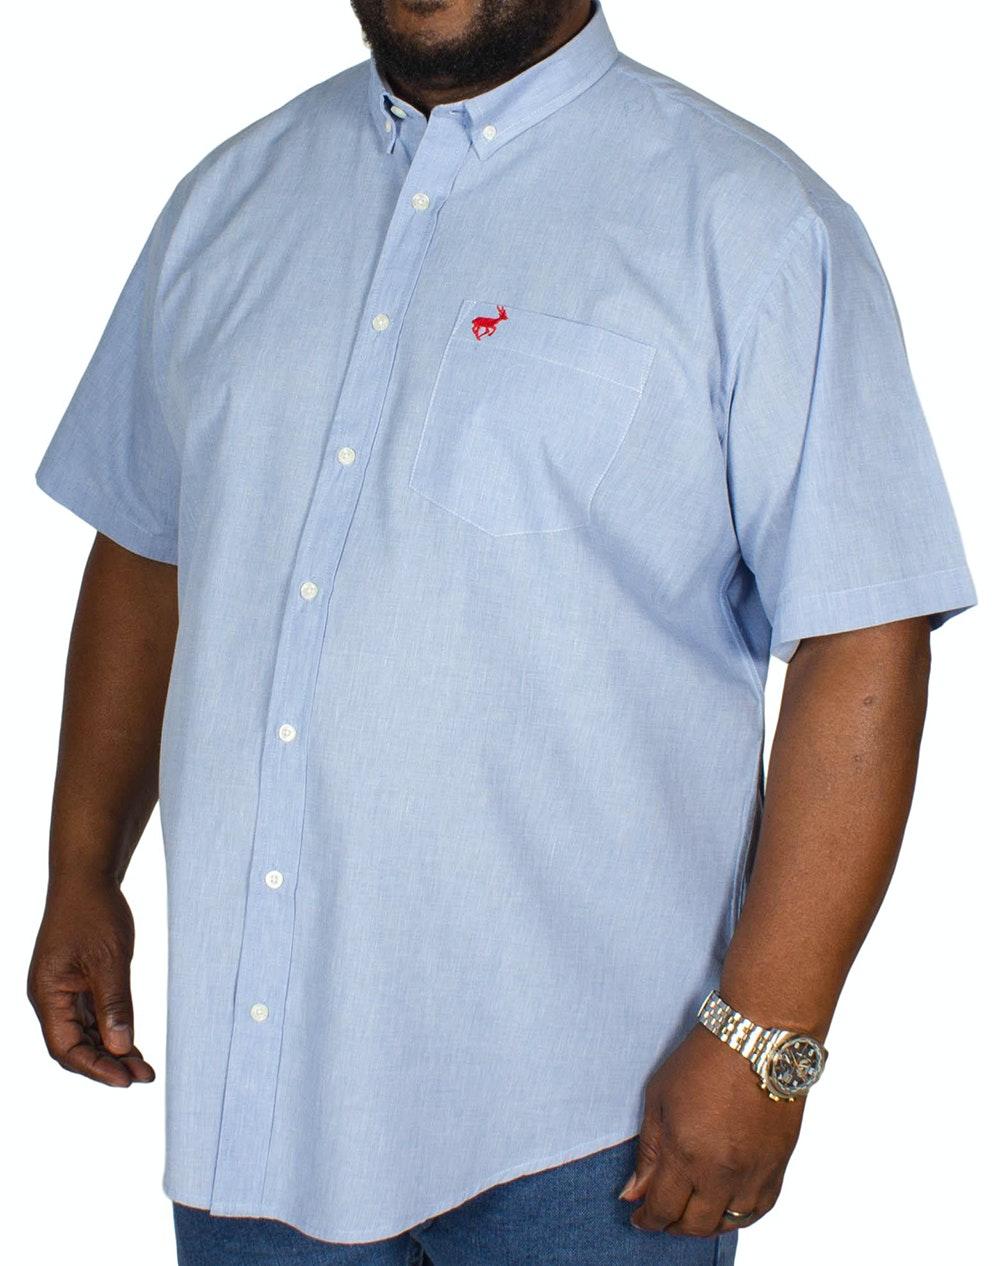 Bigdude Short Sleeve Textured Shirt Blue